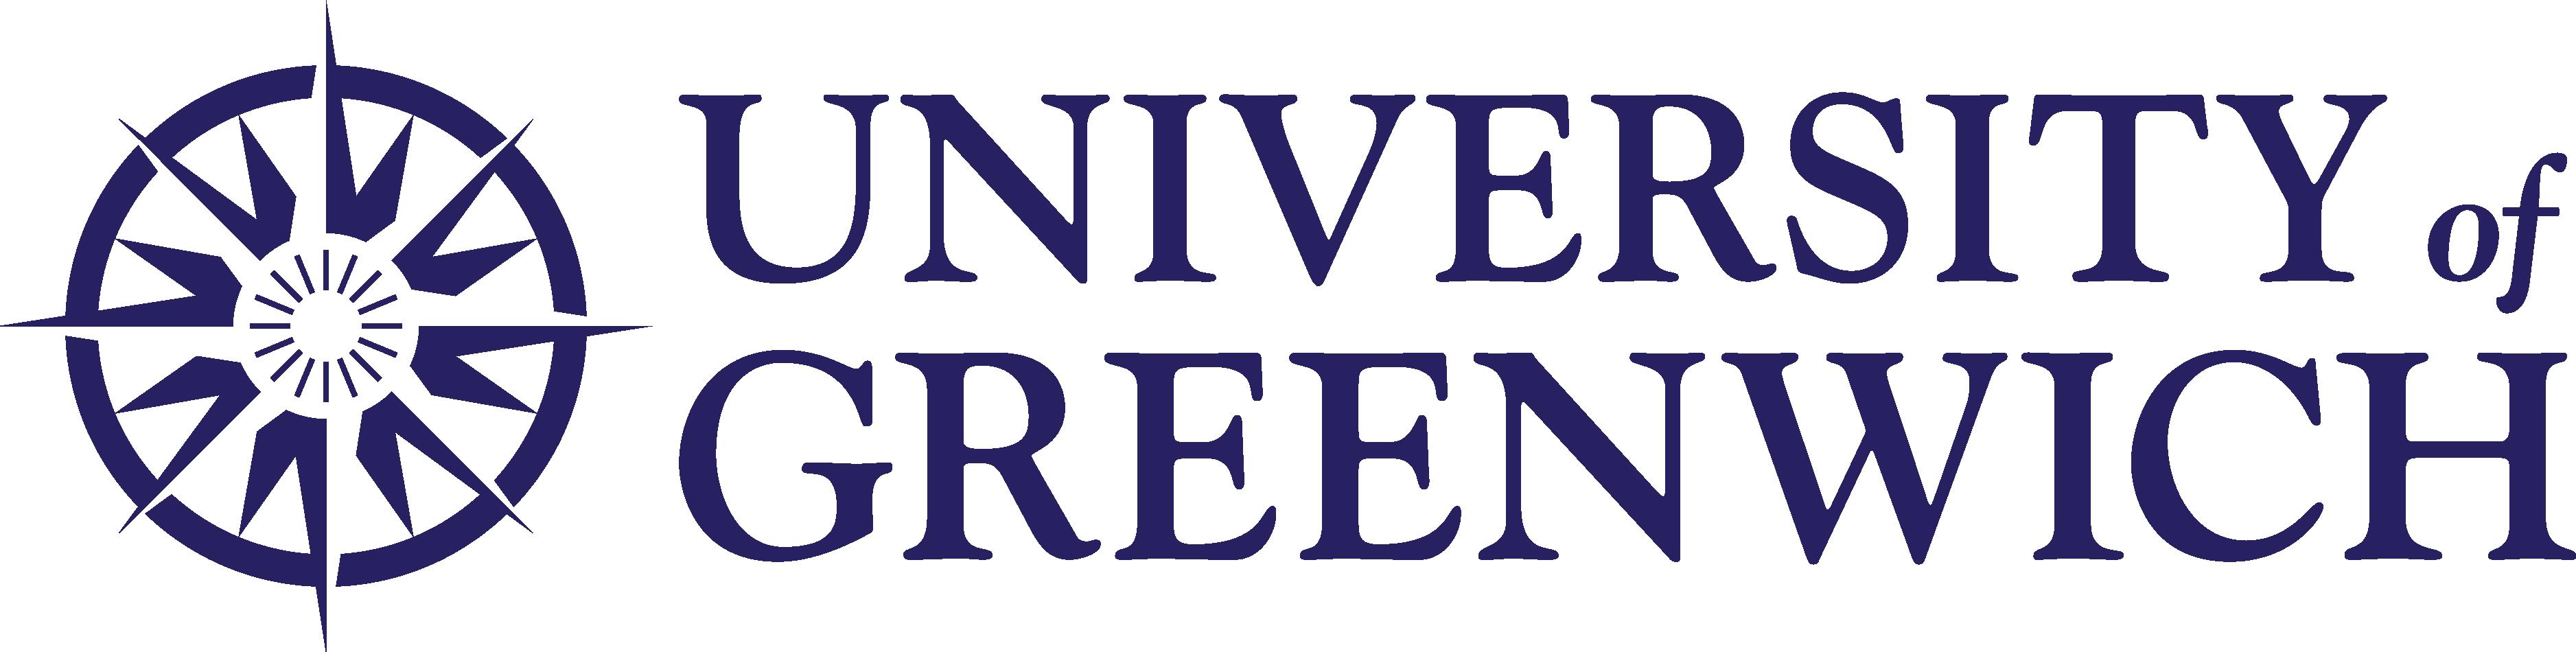 University of Greenwich img-responsive